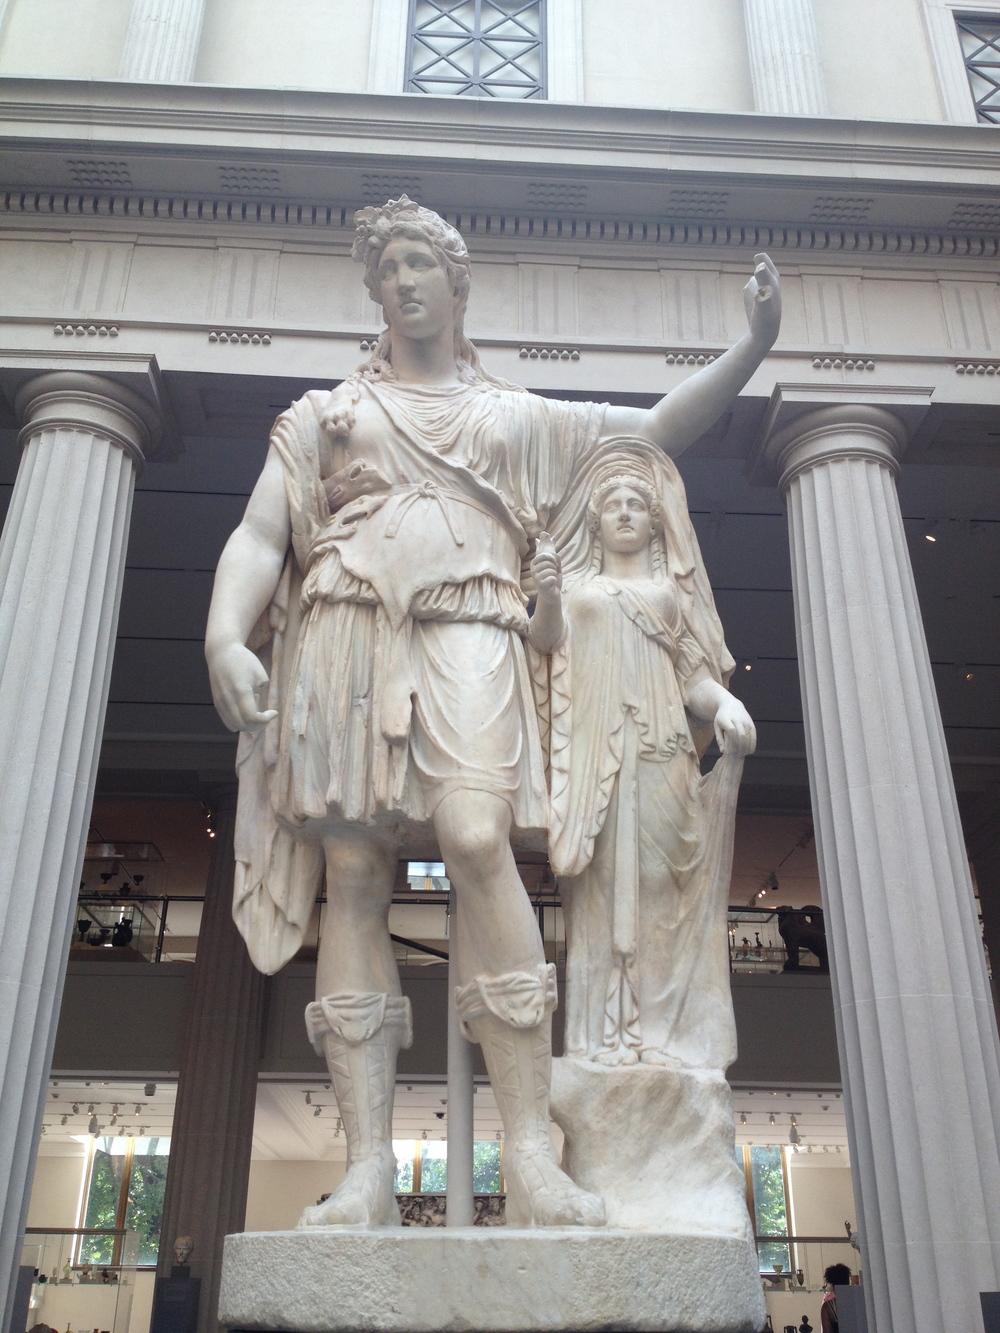 Dionysos resting his arm